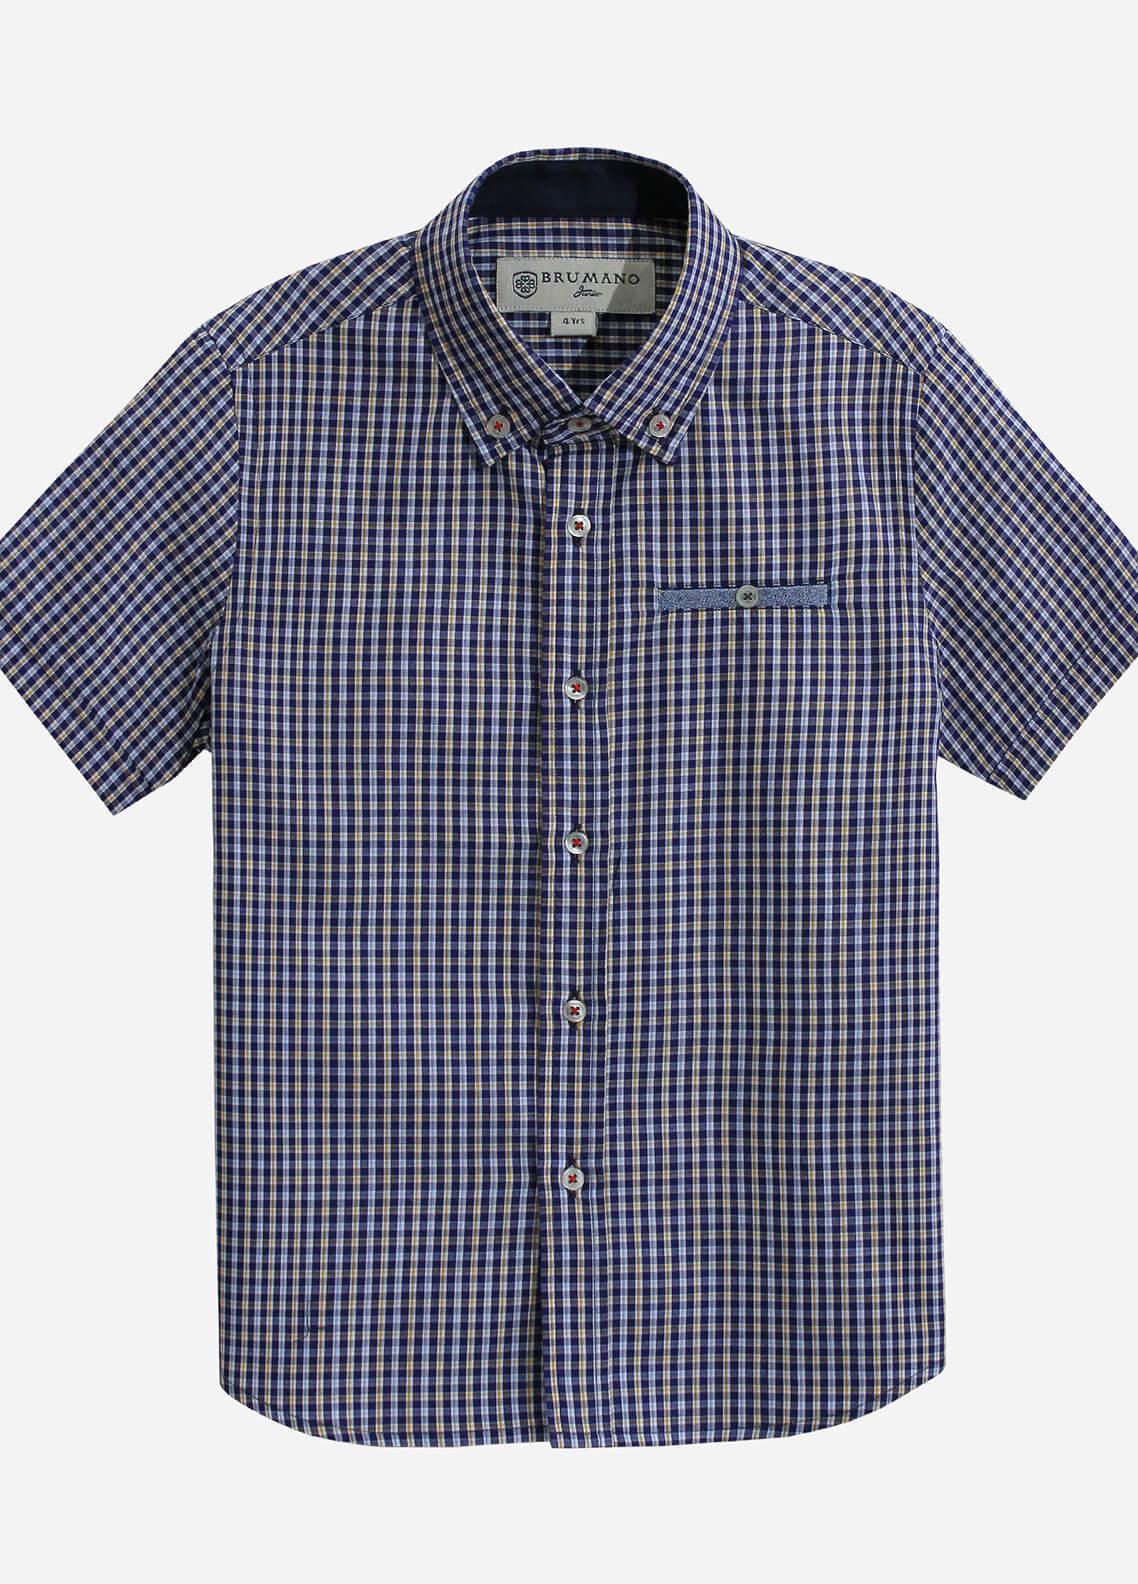 7db2b58e Kids Clothing Online: Kids Clothes - Children Wear Range | Sanaulla ...